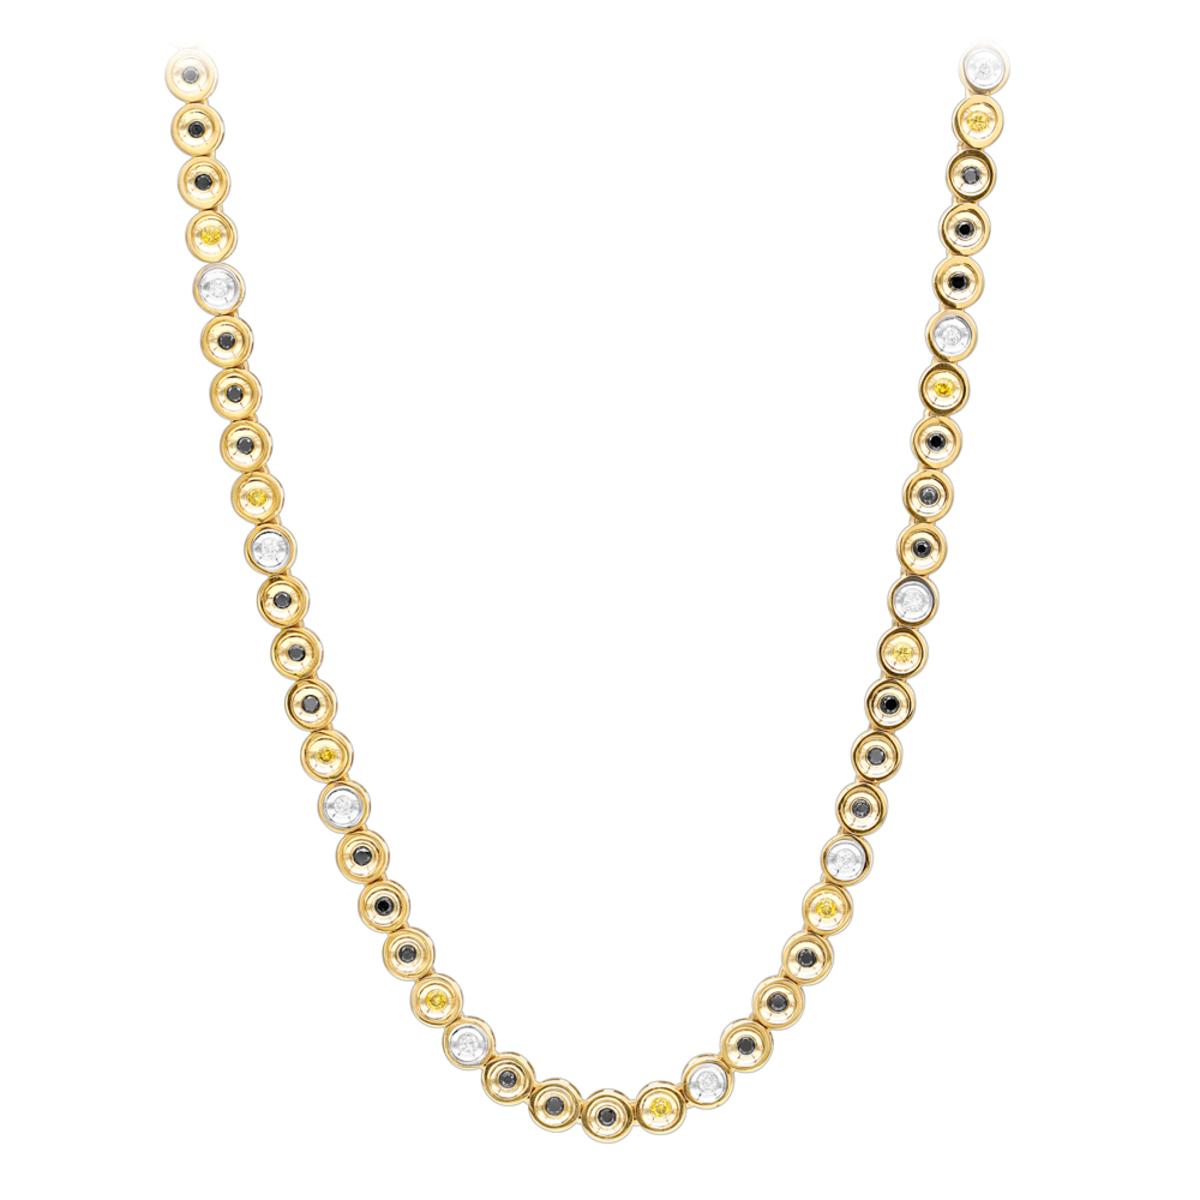 LUXURMAN 10K Gold White Yellow Black Diamond Necklace for ...  LUXURMAN 10K Go...